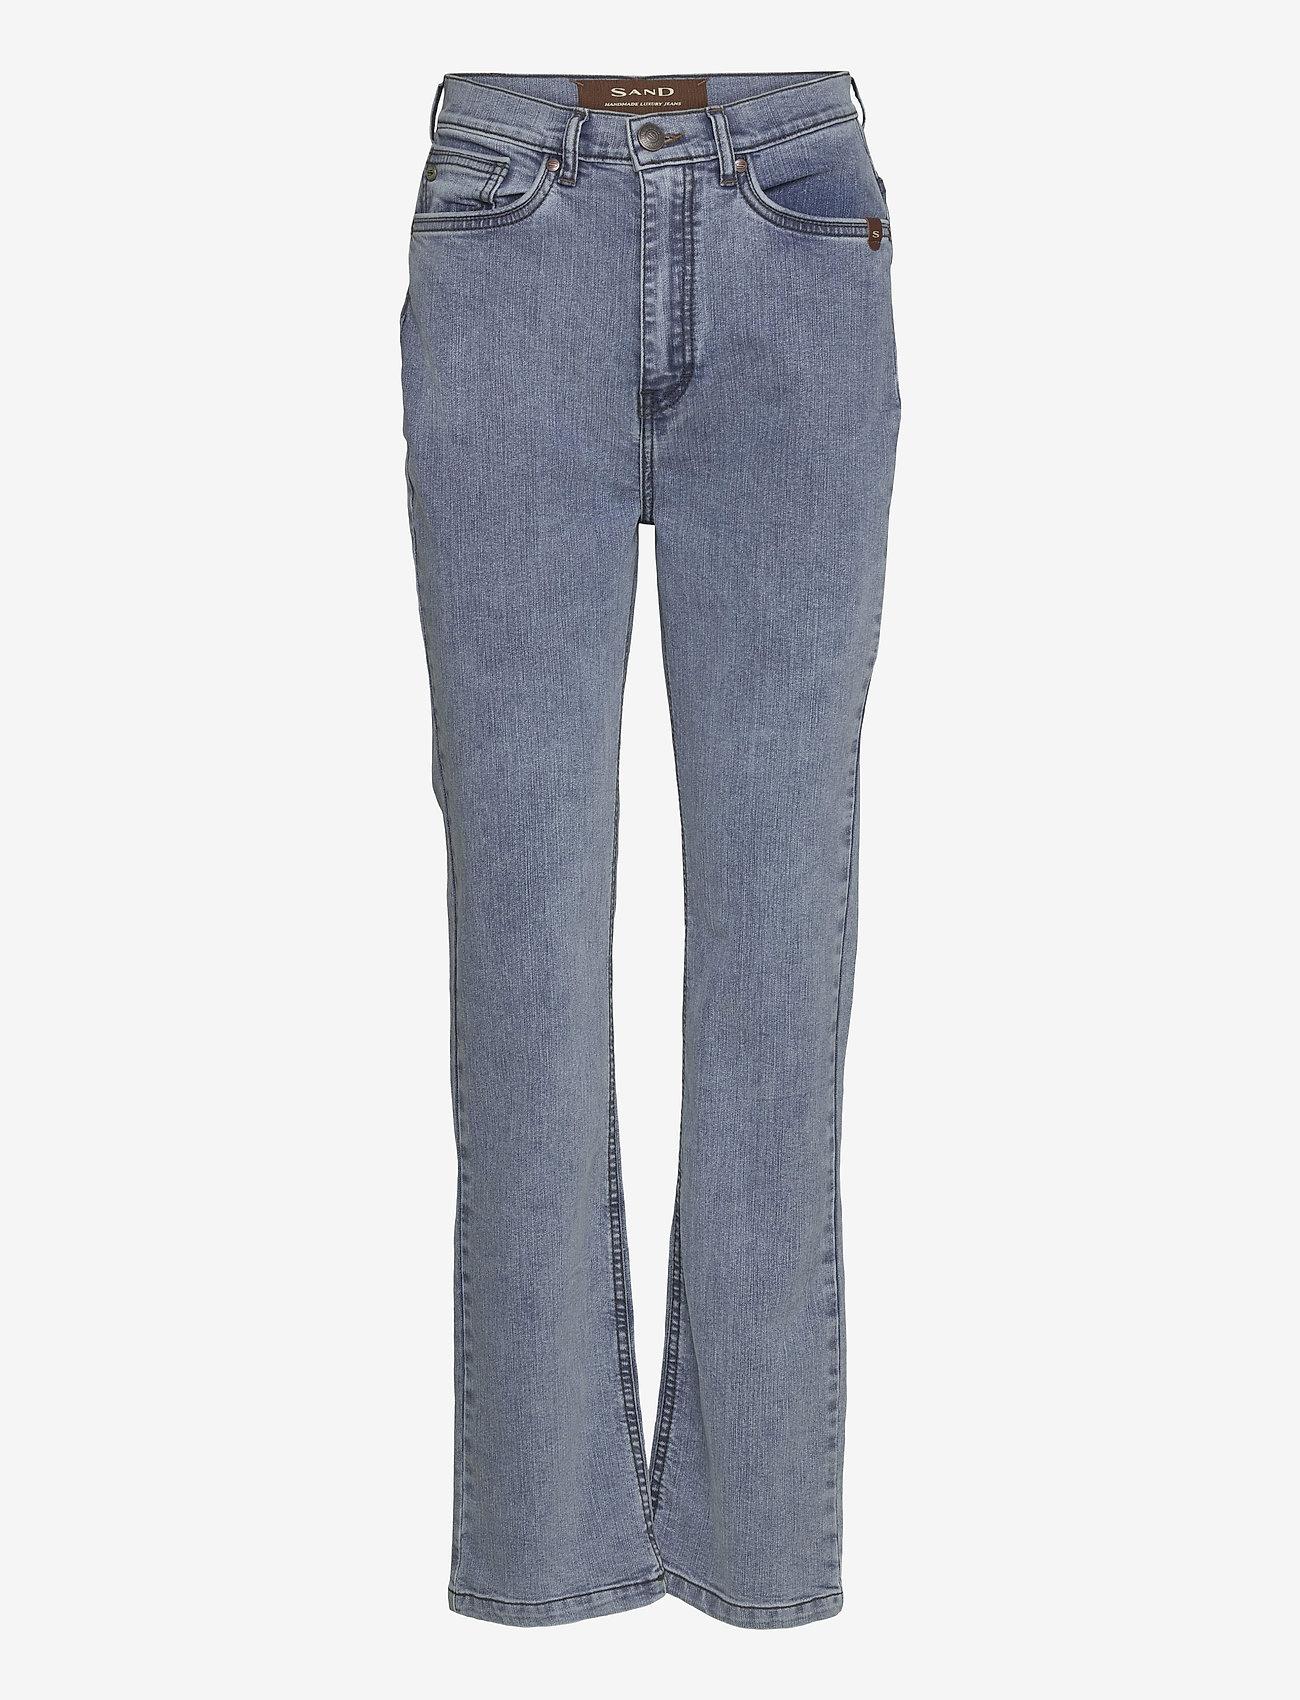 SAND - Original Denim - Kathy - boot cut jeans - pattern - 0